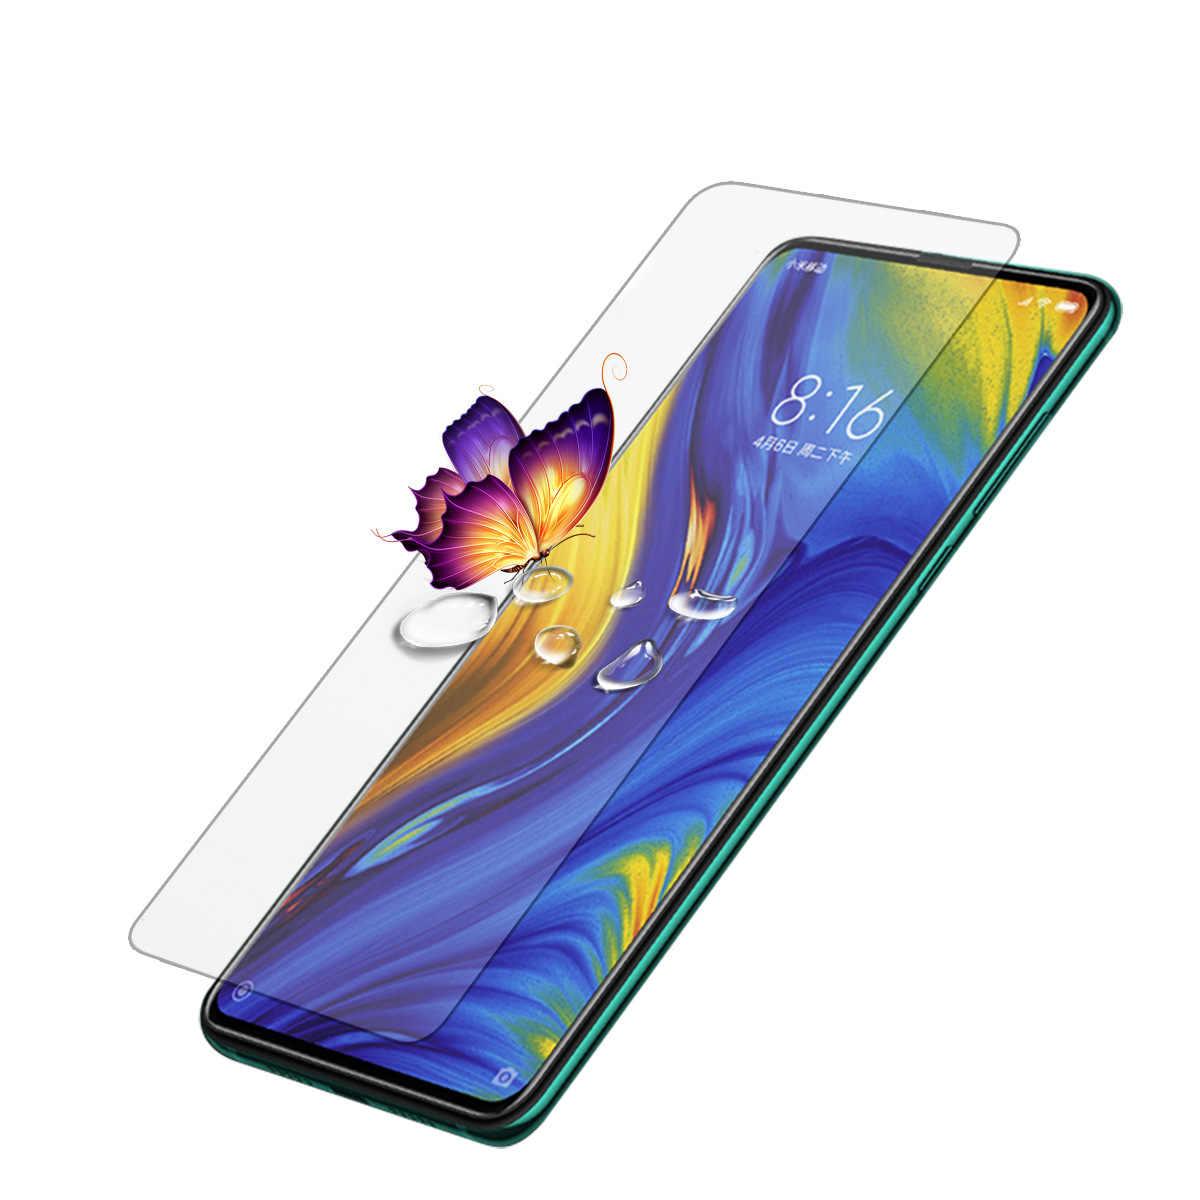 Protector de pantalla de vidrio templado para Xiaomi 9 SE 8 Lite 8Pro A2 Lite película para Redmi 7 6 6A 6Pro Note7 note7 Pro Note6 Pro